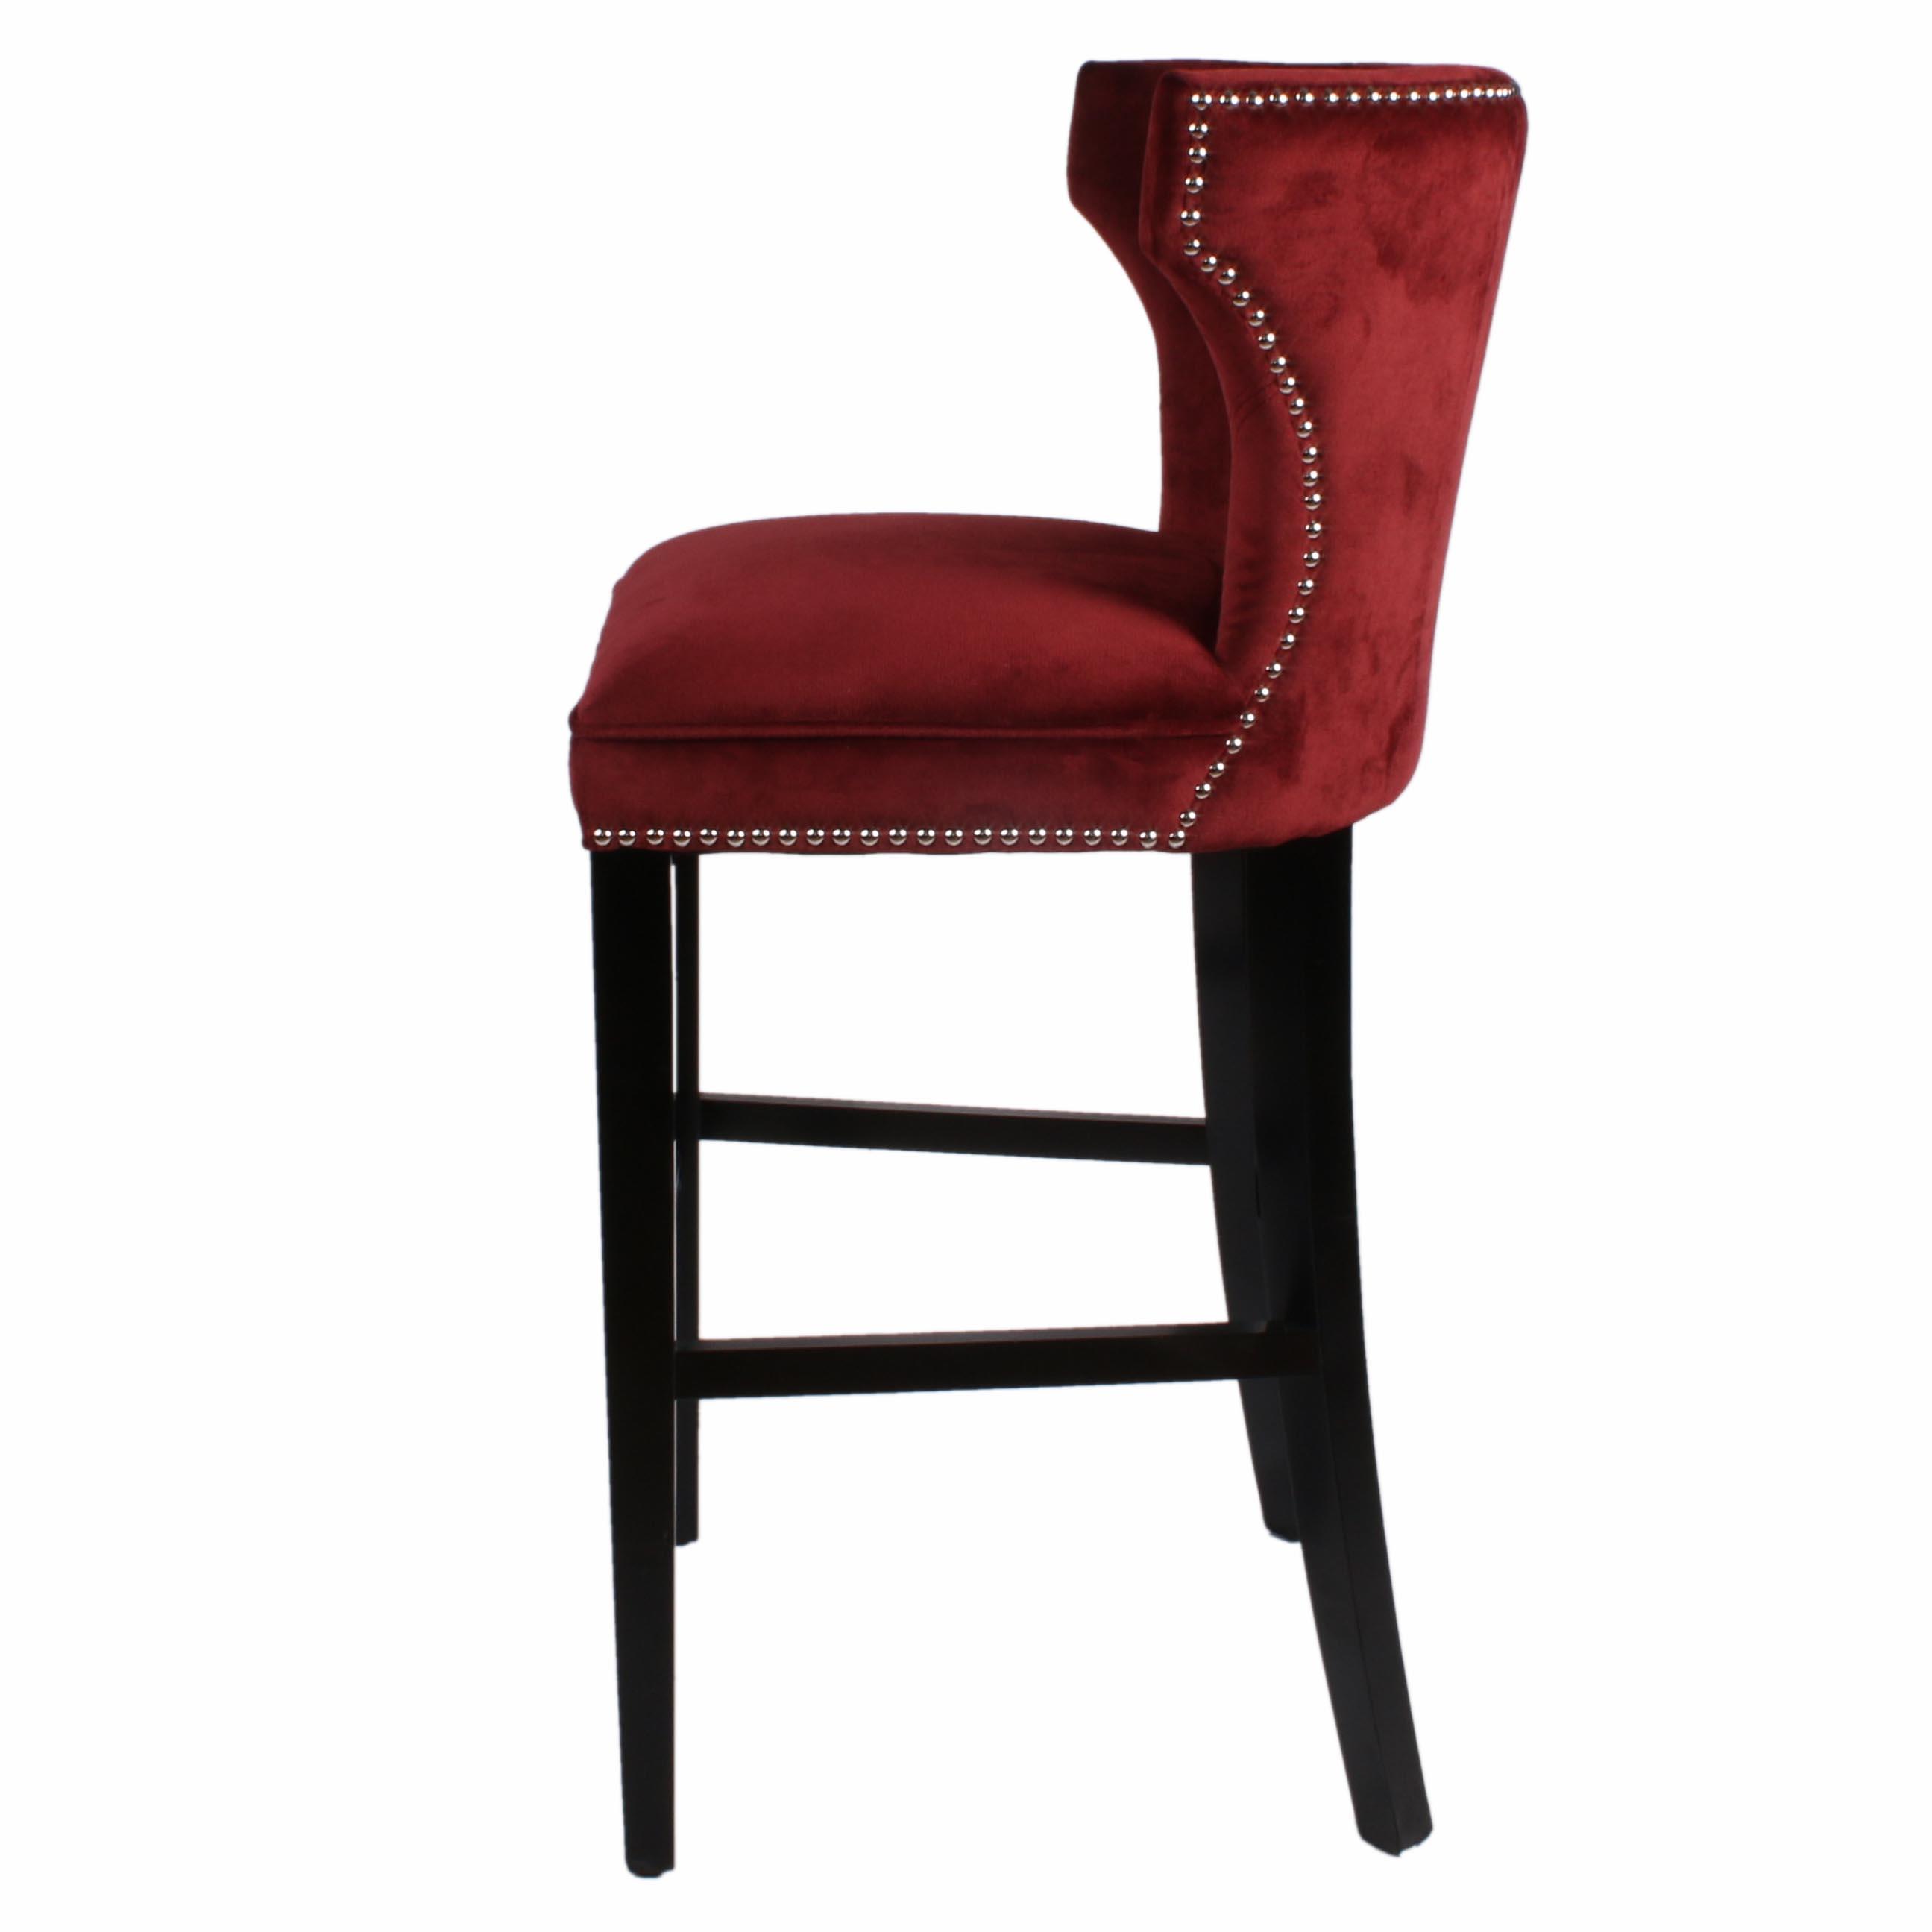 Amazing Dexter Fabric Bar Stool Black Legs Cranberry Uwap Interior Chair Design Uwaporg